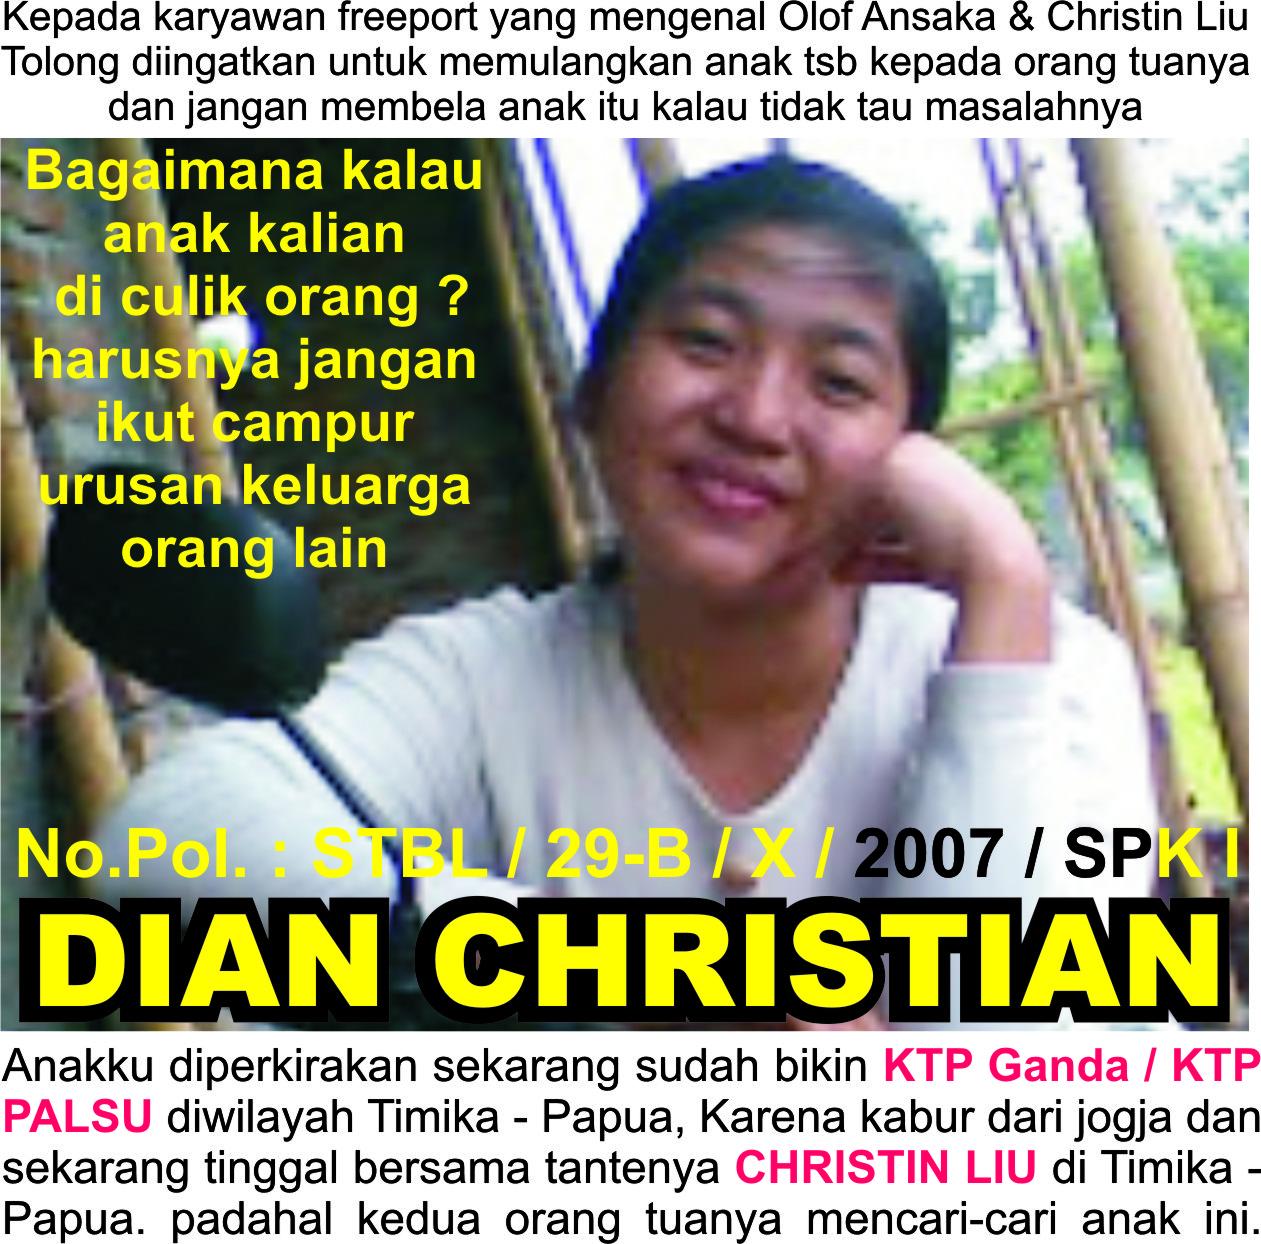 Harga Baja Ringan Bekas Kisah Nyata Anak Kristen Di Didik Tidak Takut Tuhan Oleh ...